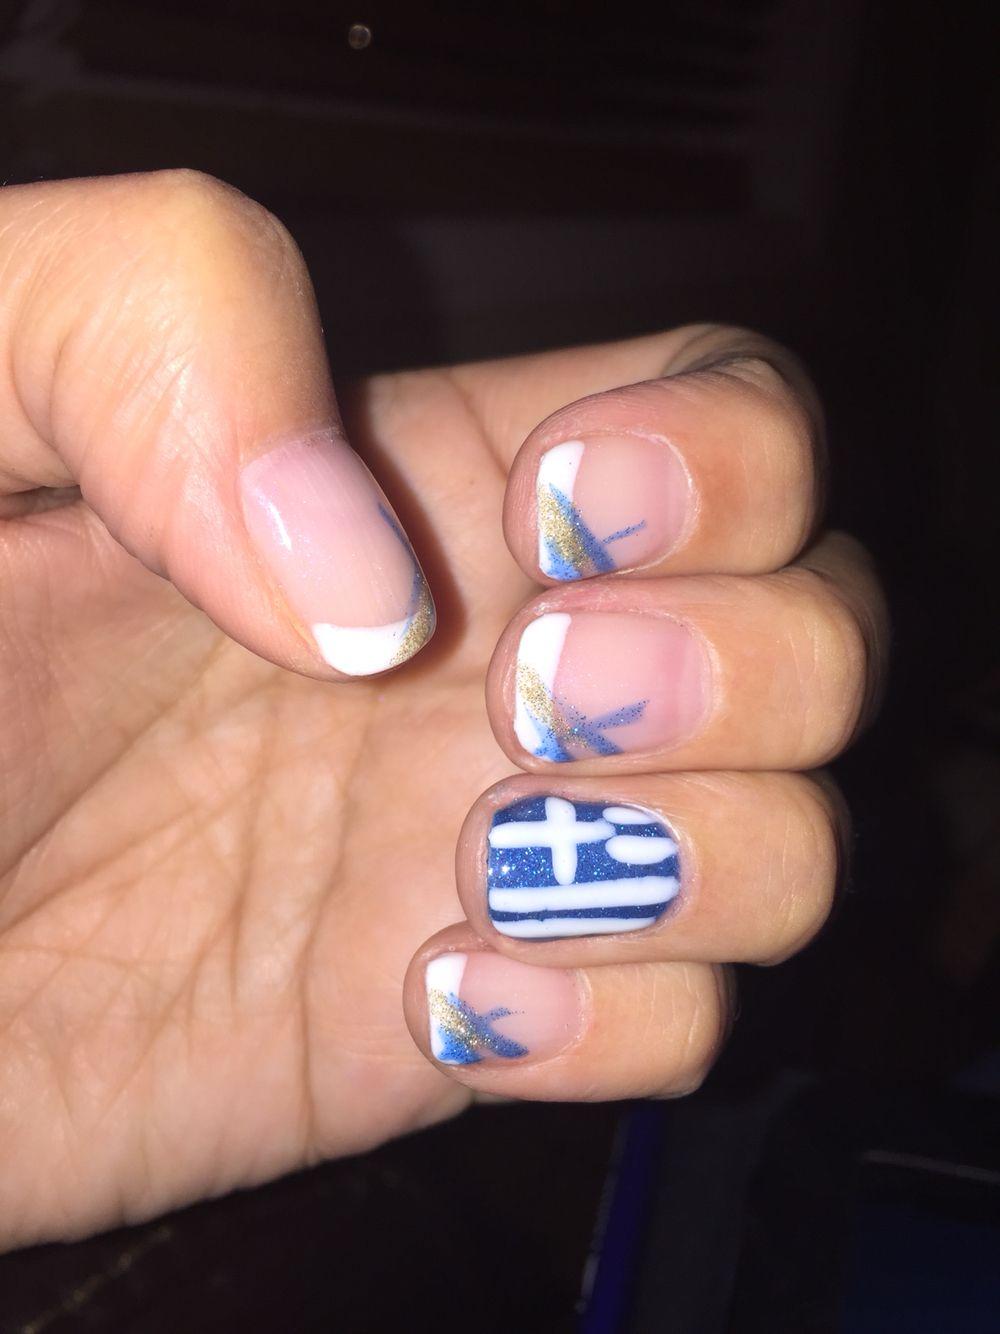 Pin By Oso On Greek Nails Pinterest Nails Gel Nails And Nail